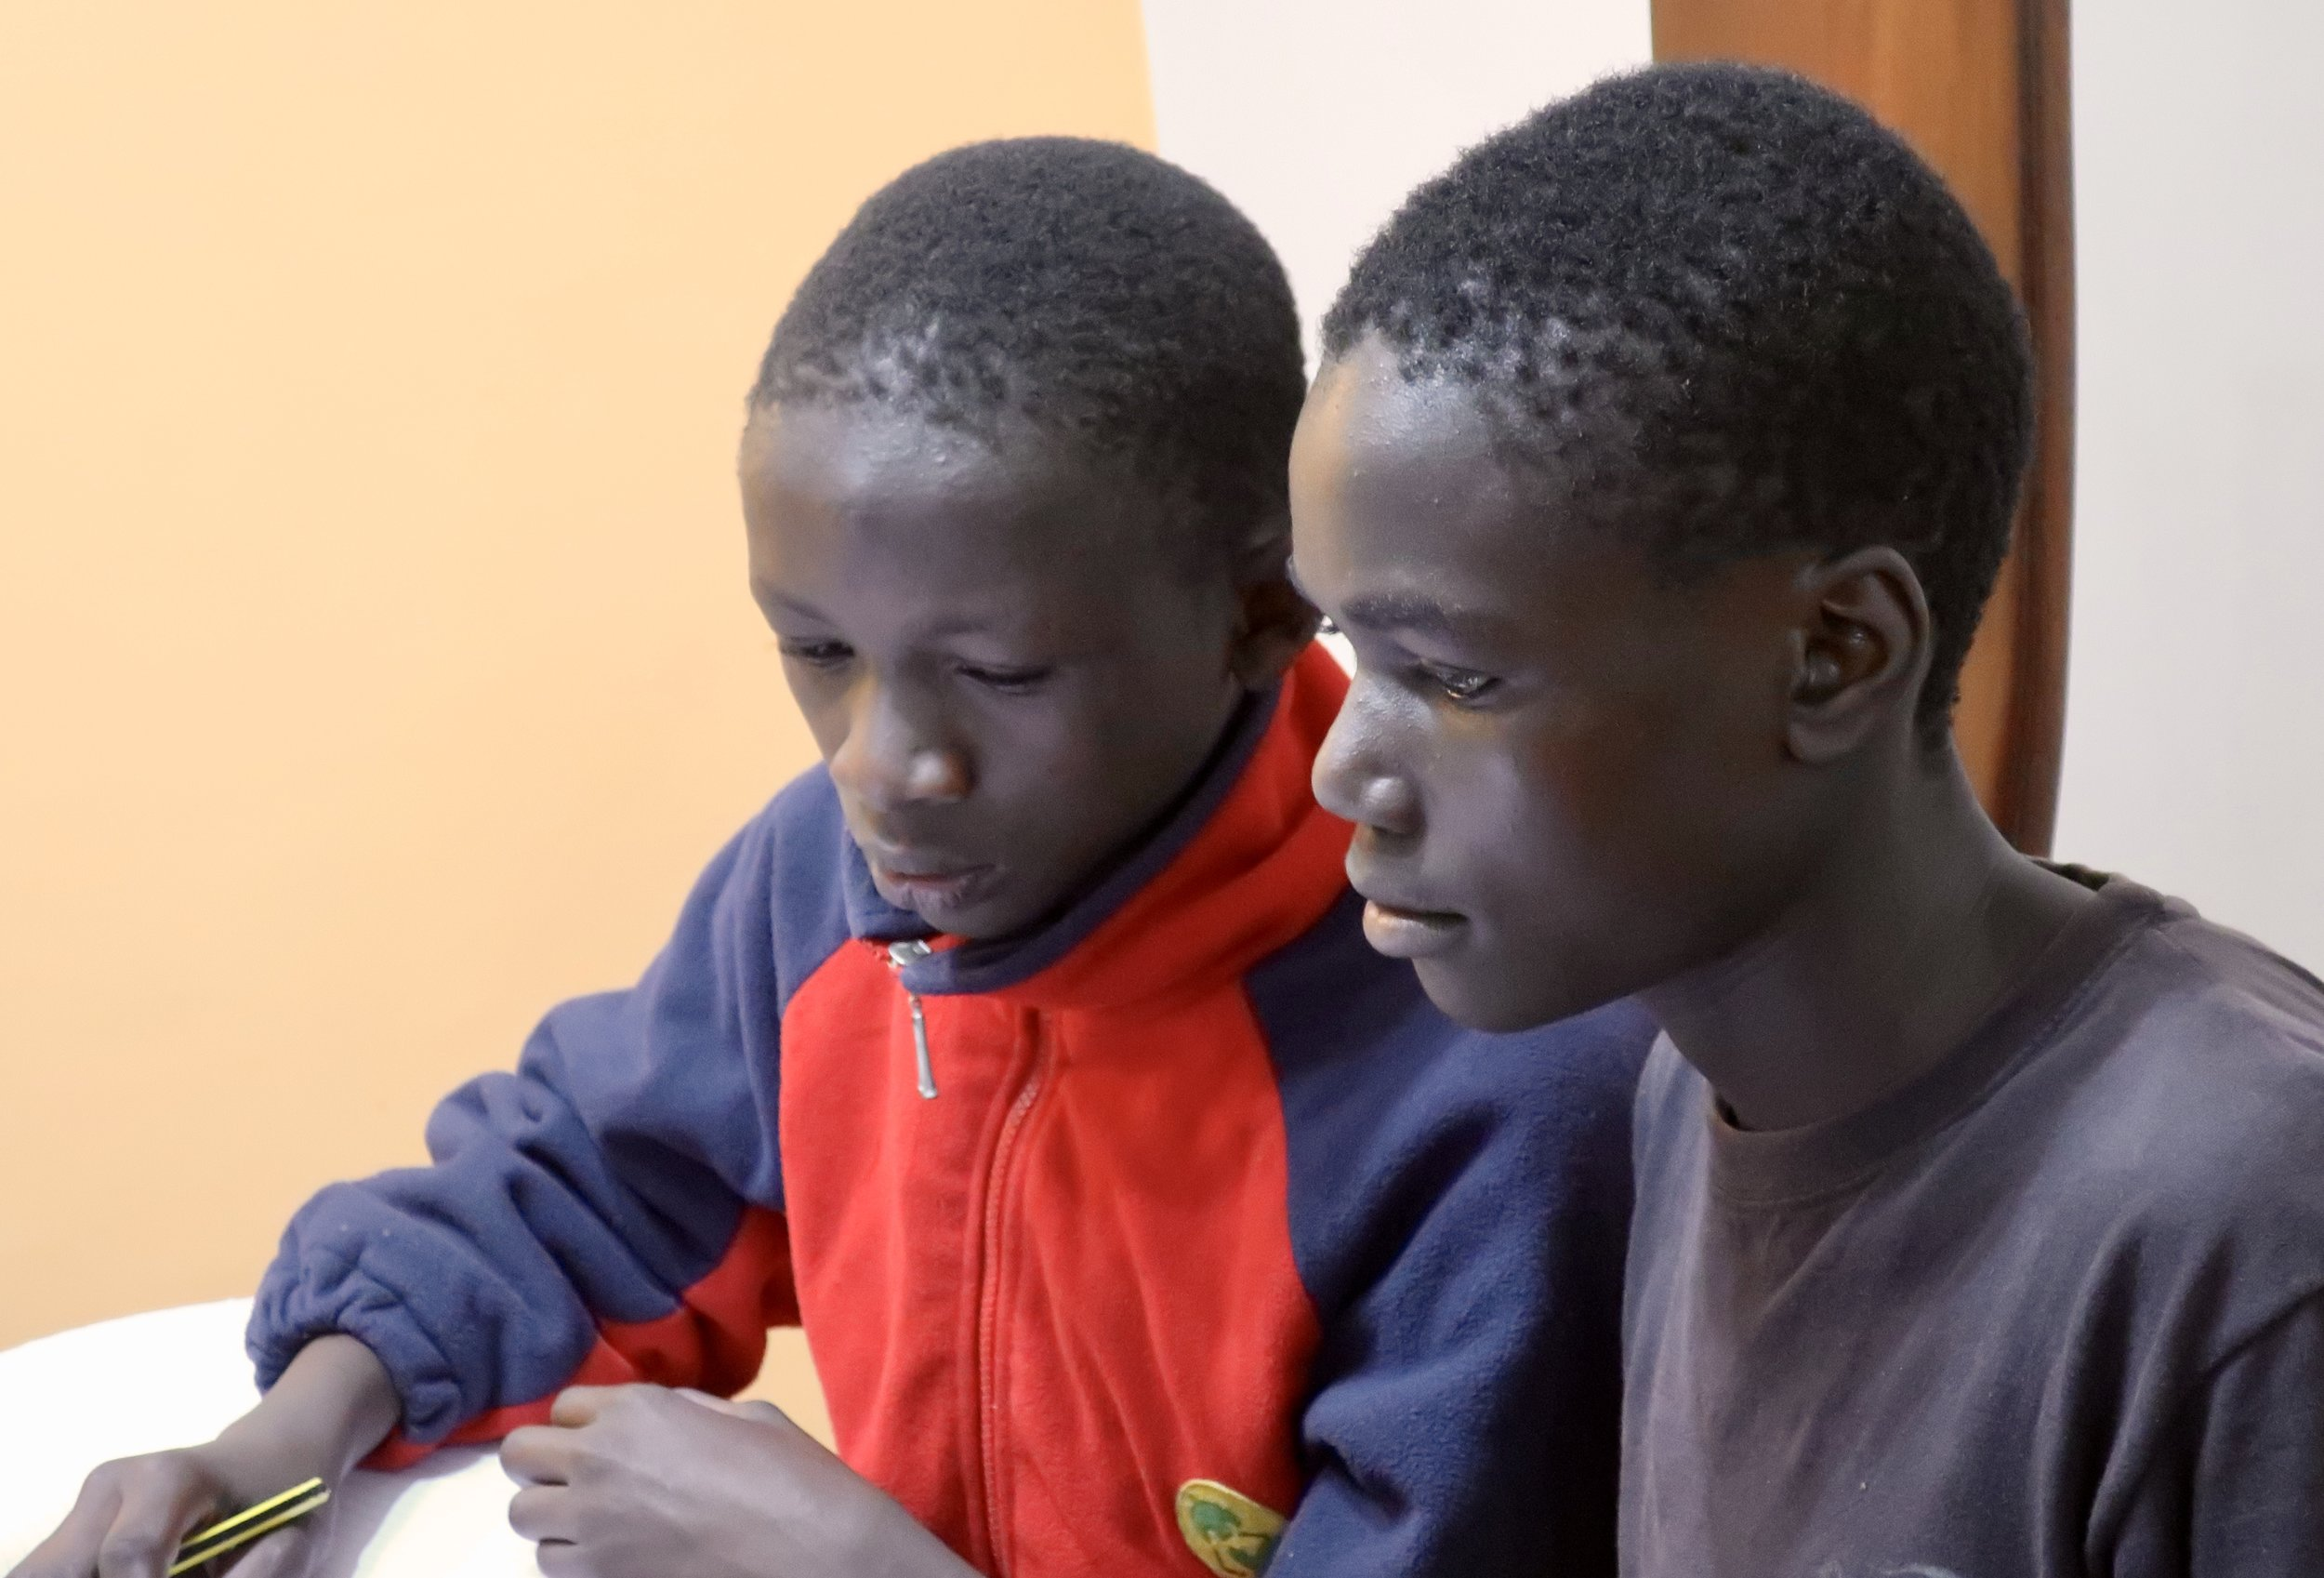 Bravin and Daniel studying during term break.